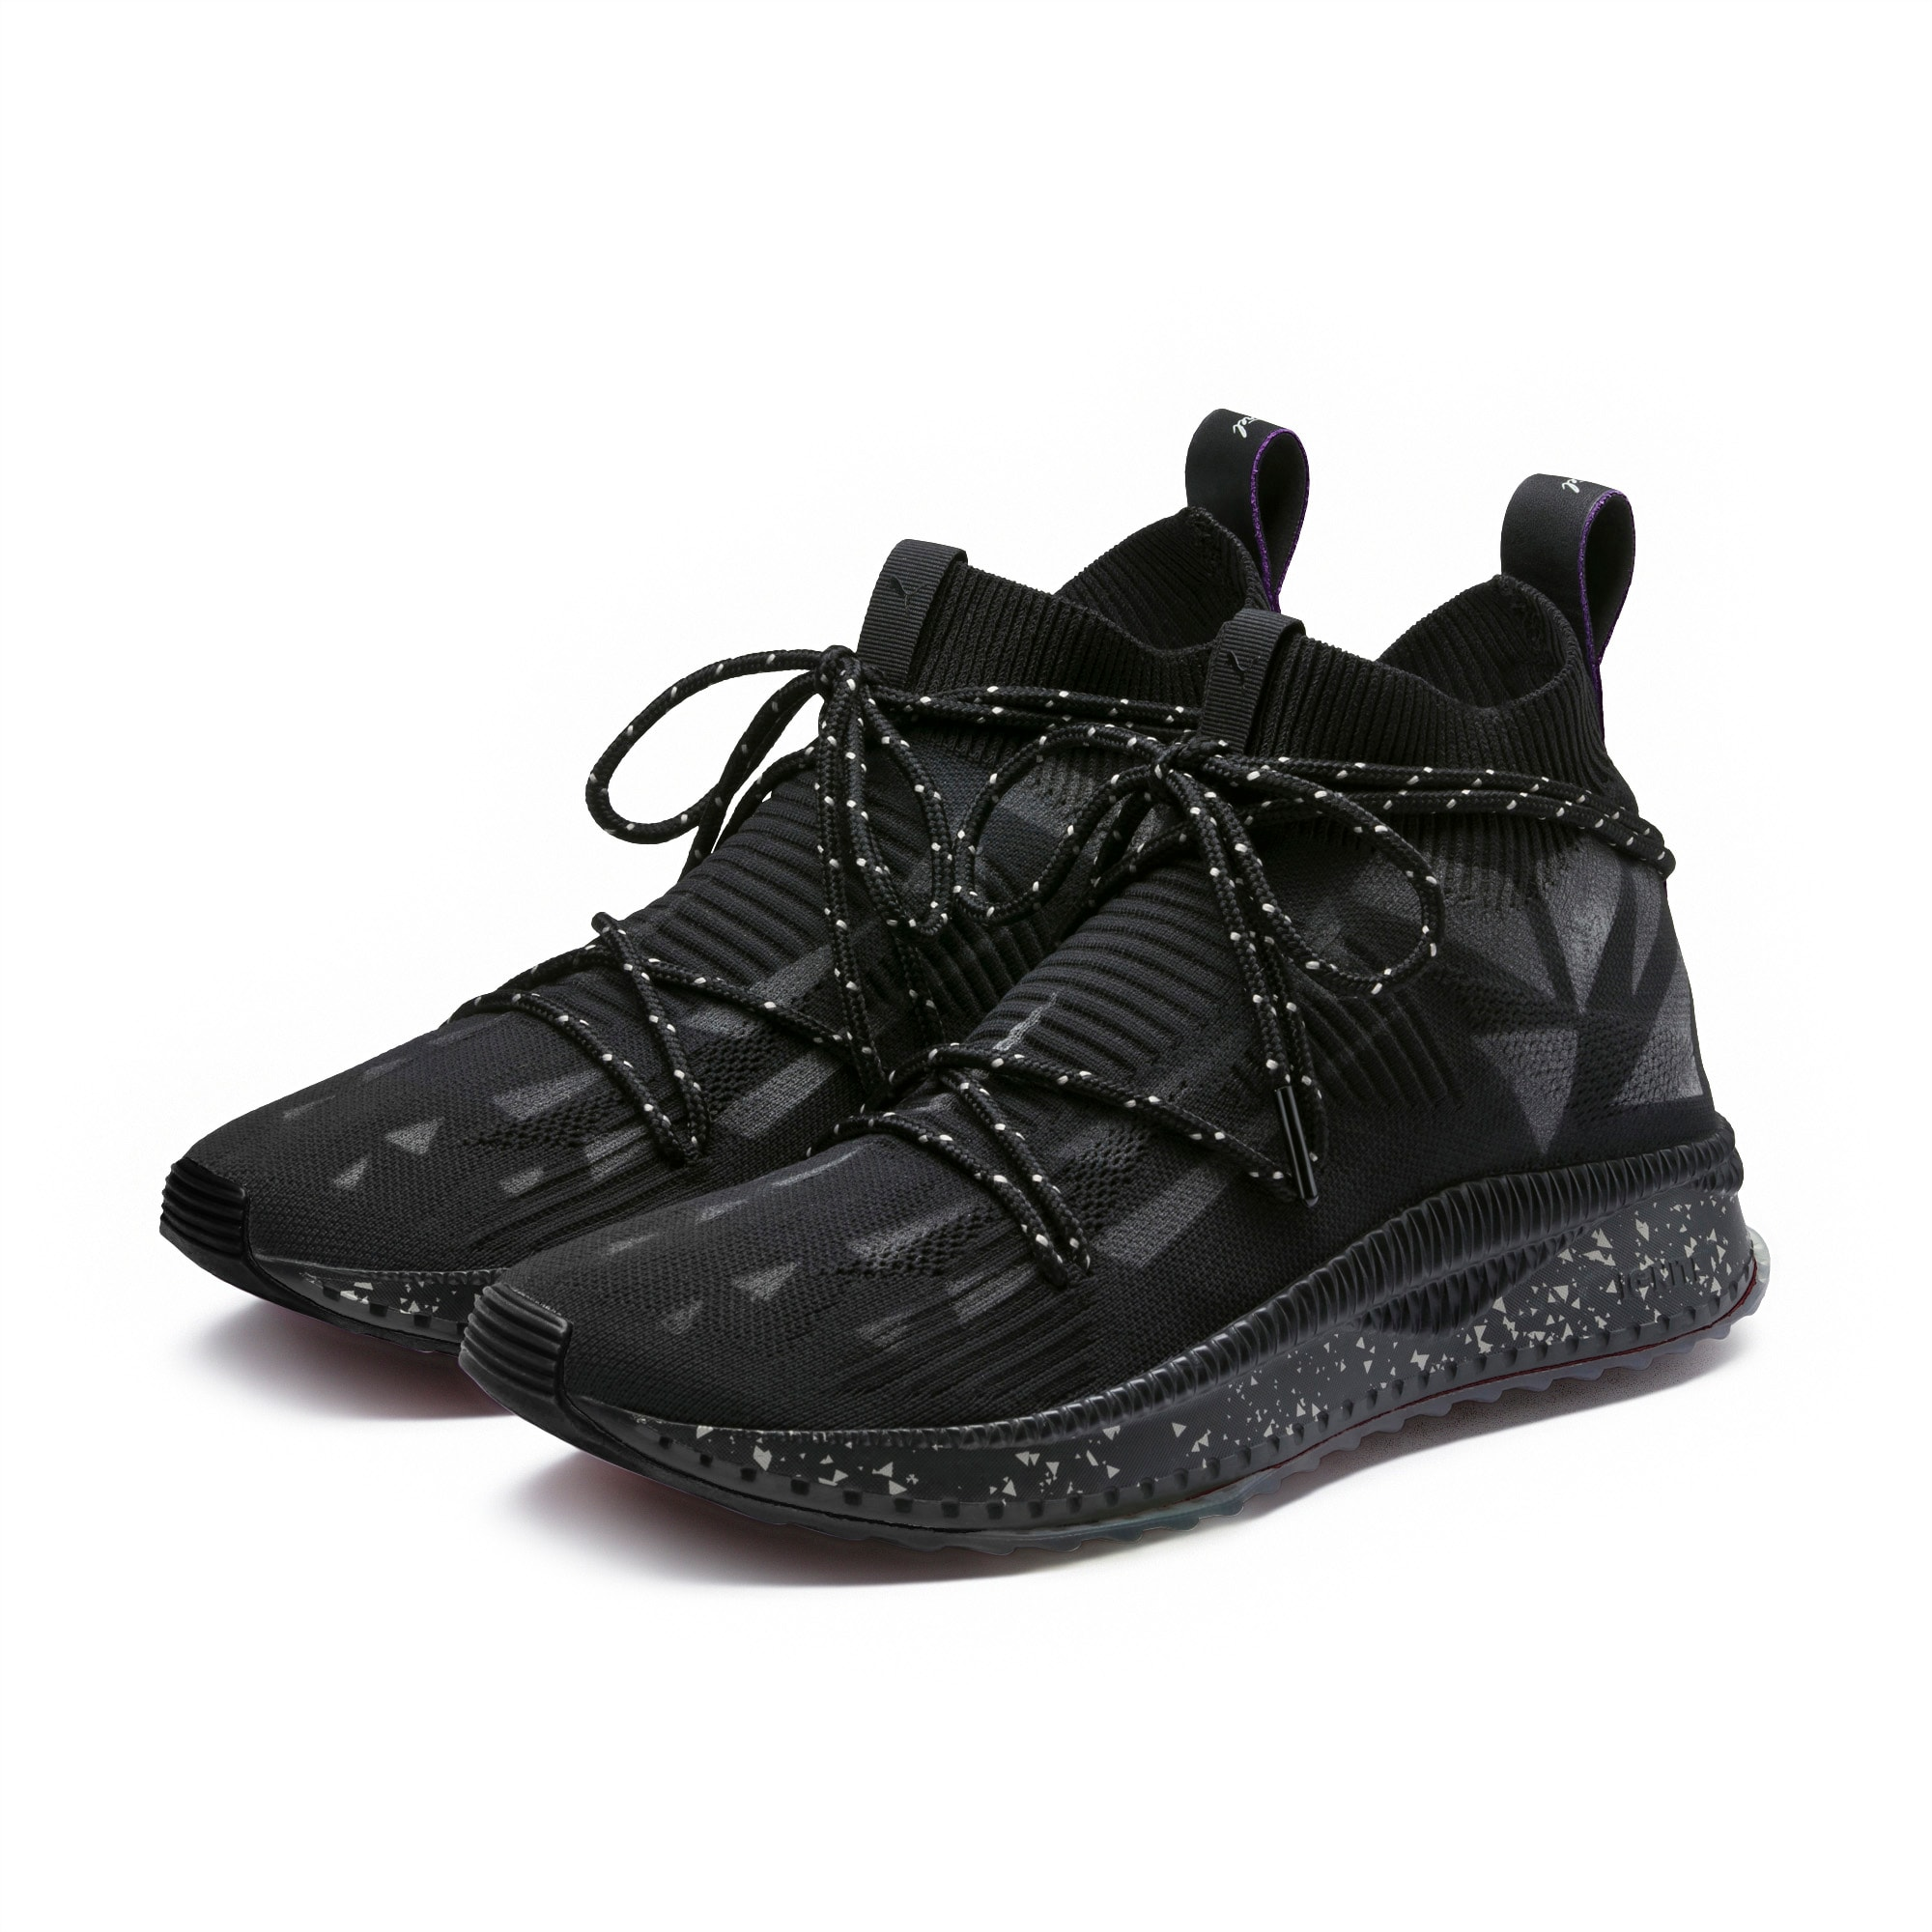 PUMA Mens Tsugi Evoknit Sock Naturel Ankle-High Fabric Fashion Sneaker